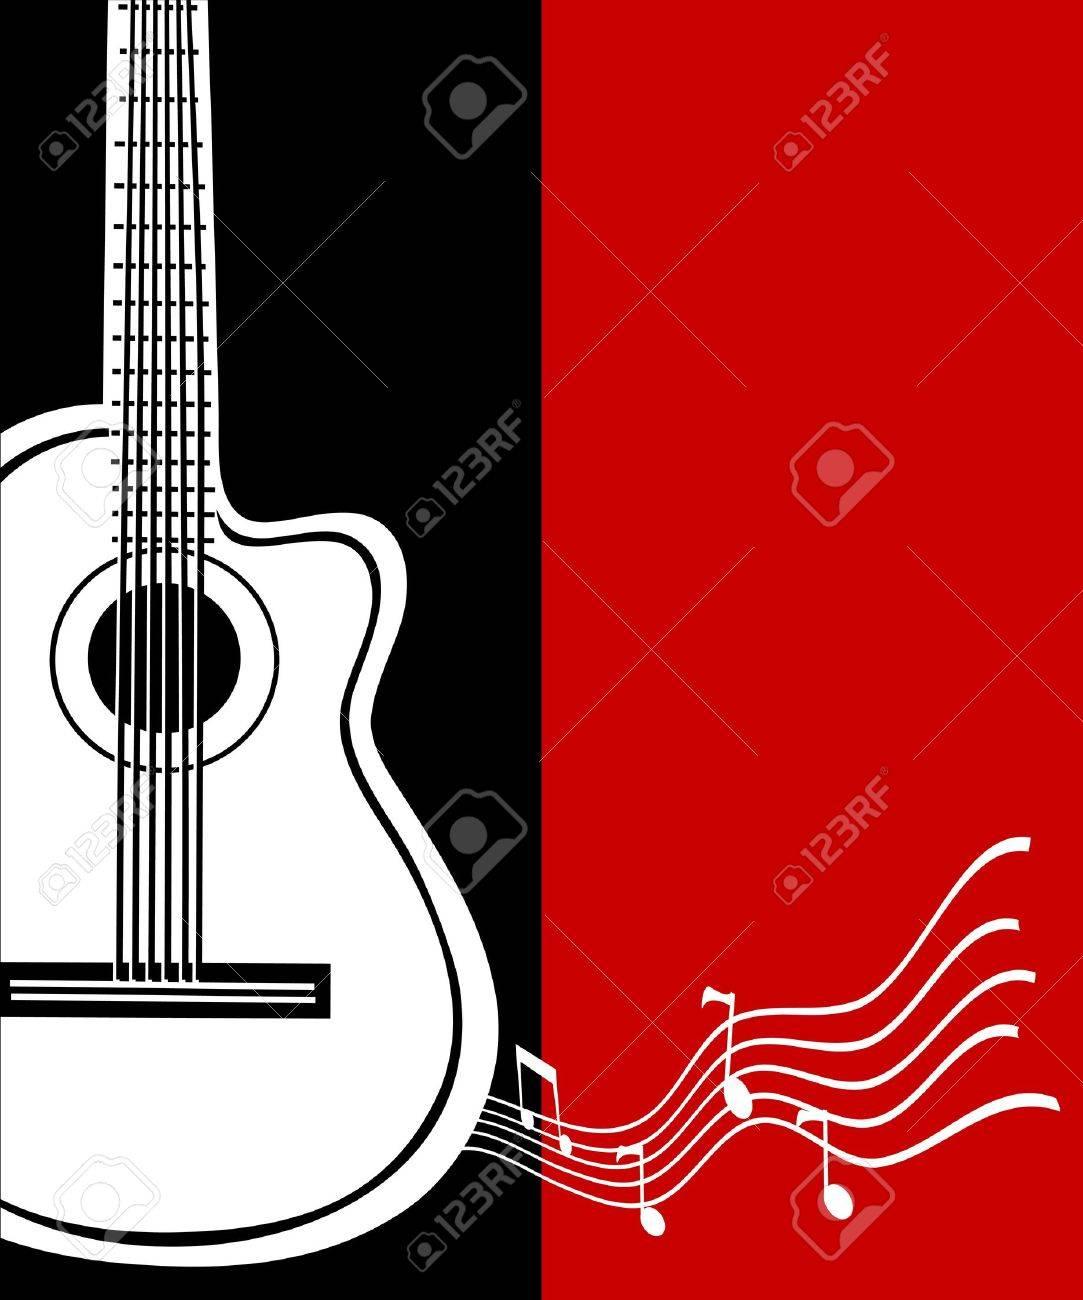 Classical vector guitar. Musical greeting card. Stock Vector - 15206997